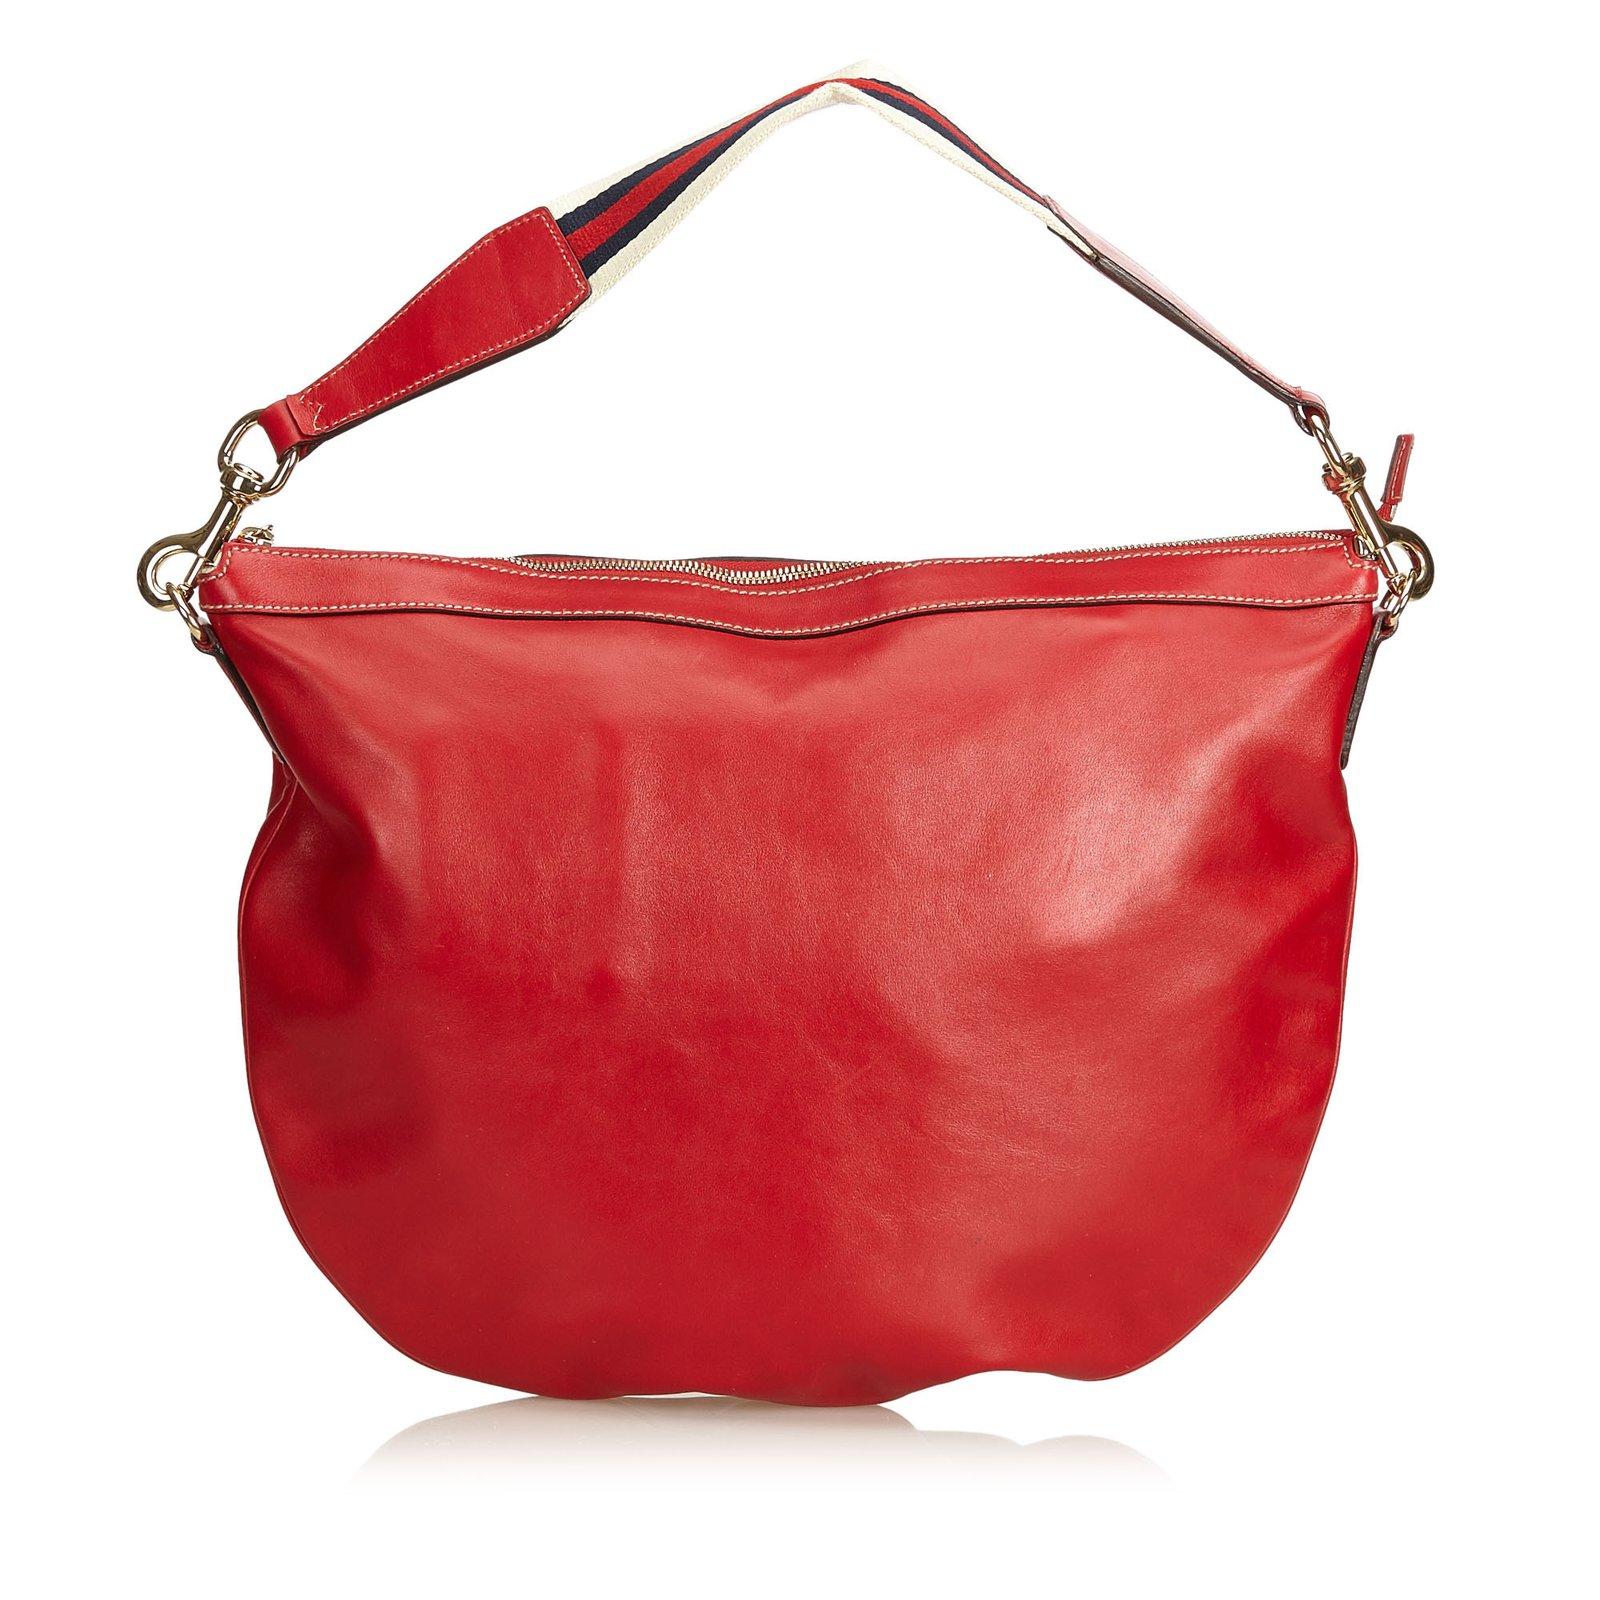 f1127321013ef0 Gucci Web Leather Shoulder Bag Handbags Leather,Other Red ref.91319 ...